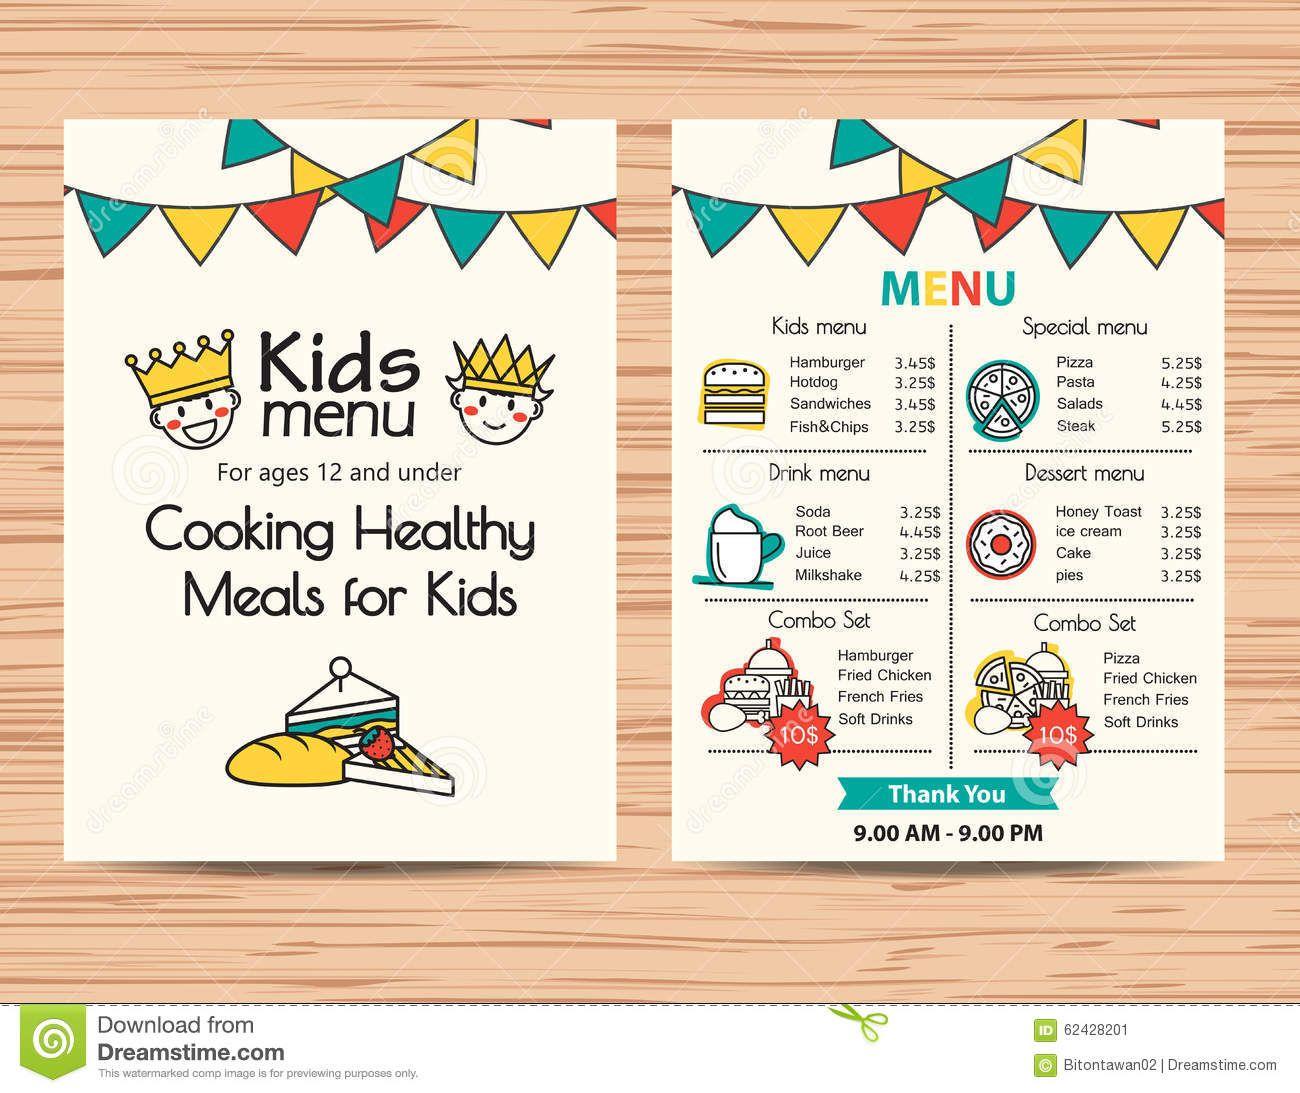 Cartoon restaurant free vector graphic download - Kids Meal Menu Vector Template Restaurant Menu Design Stock